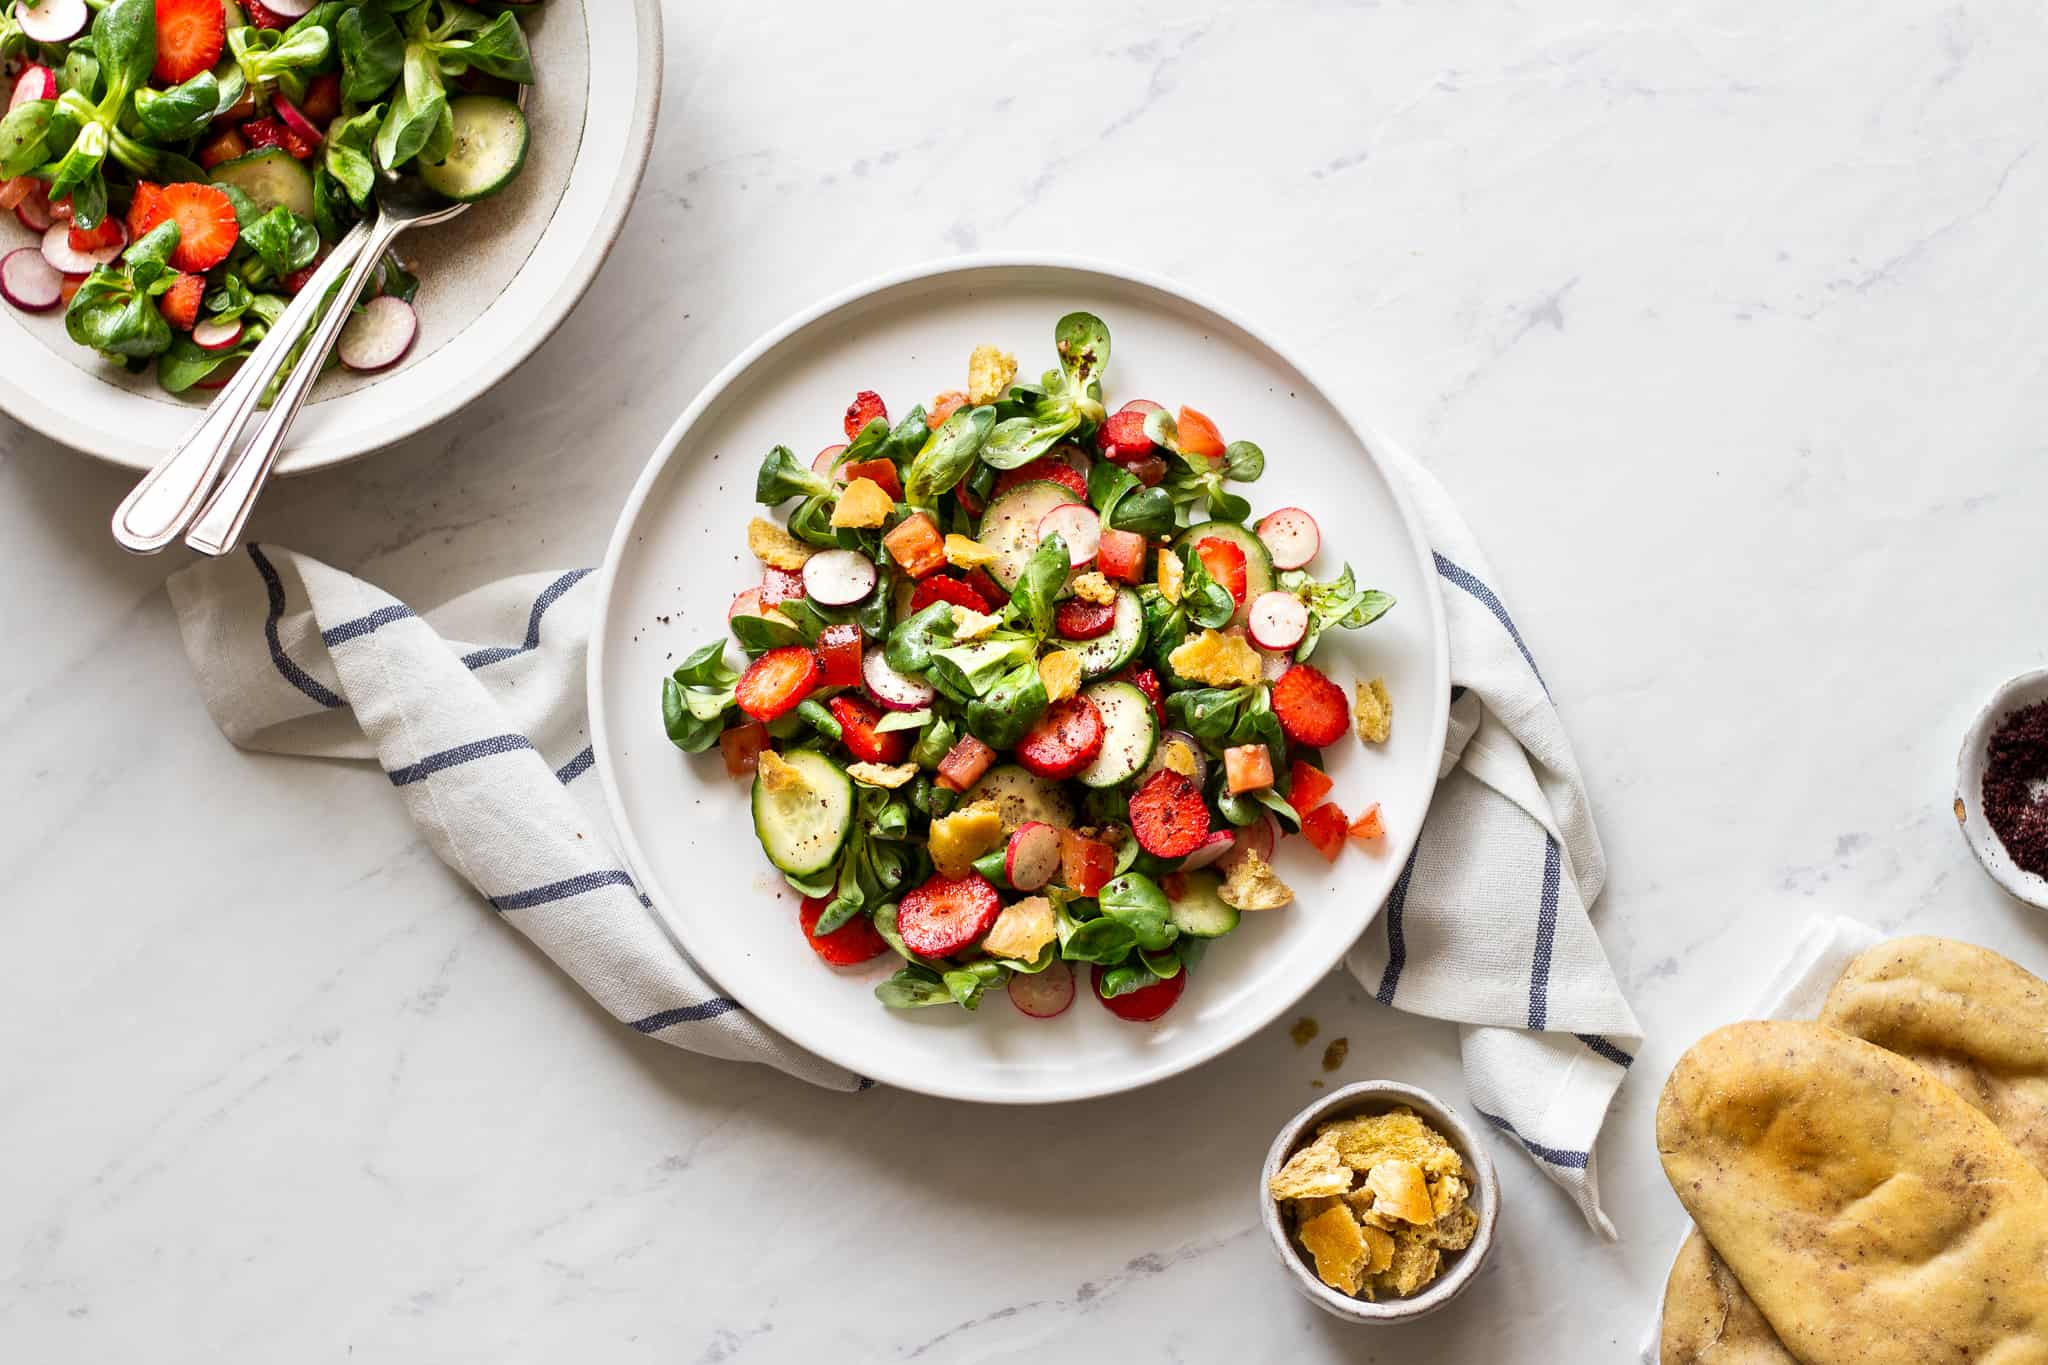 Lebanese Fattoush Salad with Strawberries